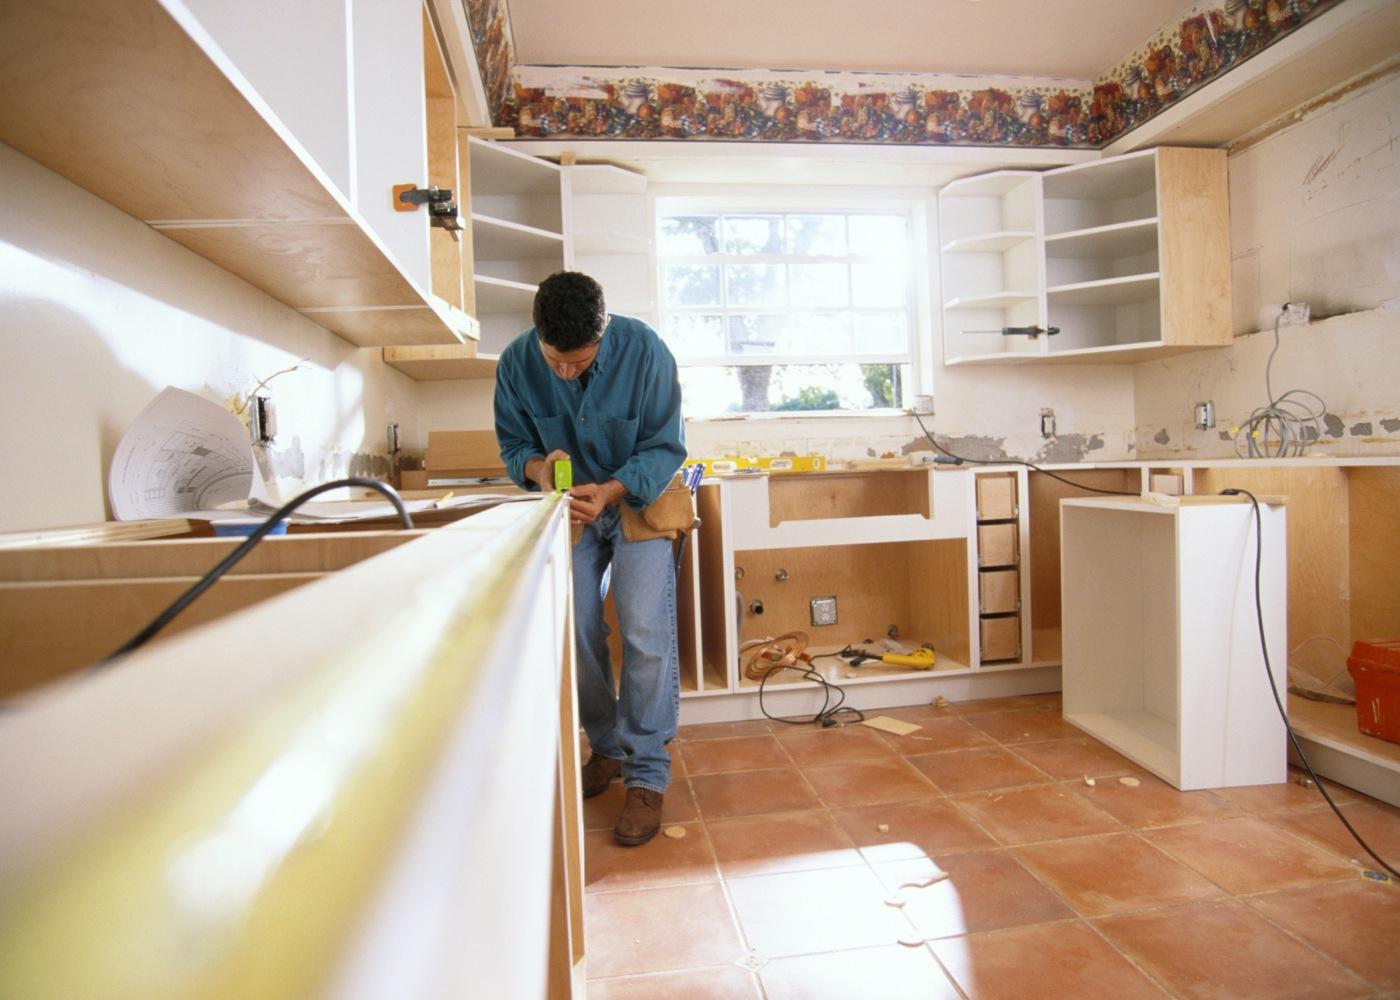 obras na cozinha